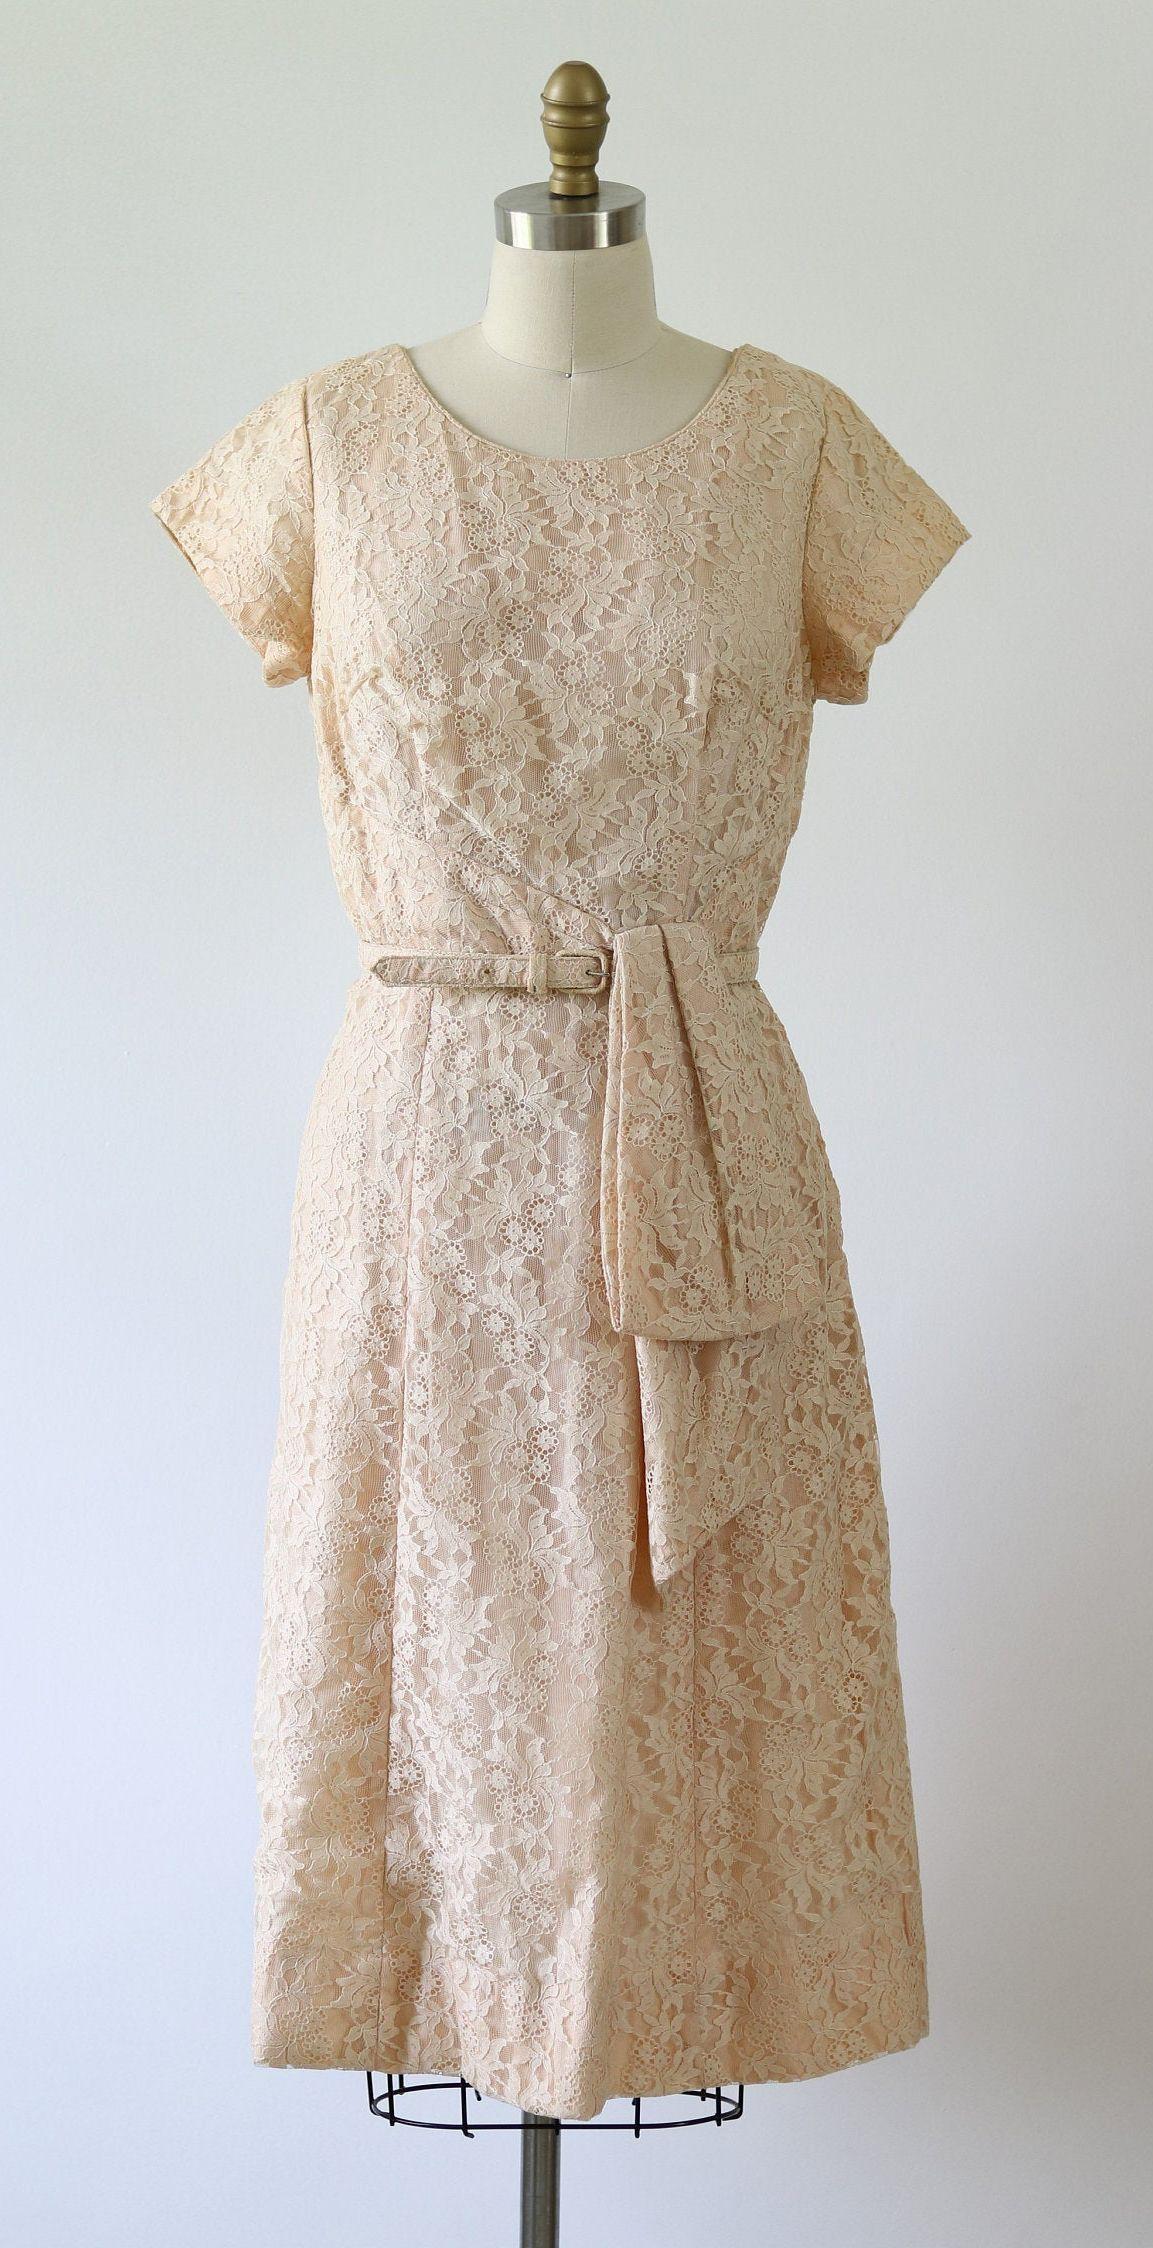 Vintage 1960s Lace Dress Formal Cocktail Etsy Lace Dress Formal Dresses 60s Aesthetic Fashion [ 2248 x 1153 Pixel ]